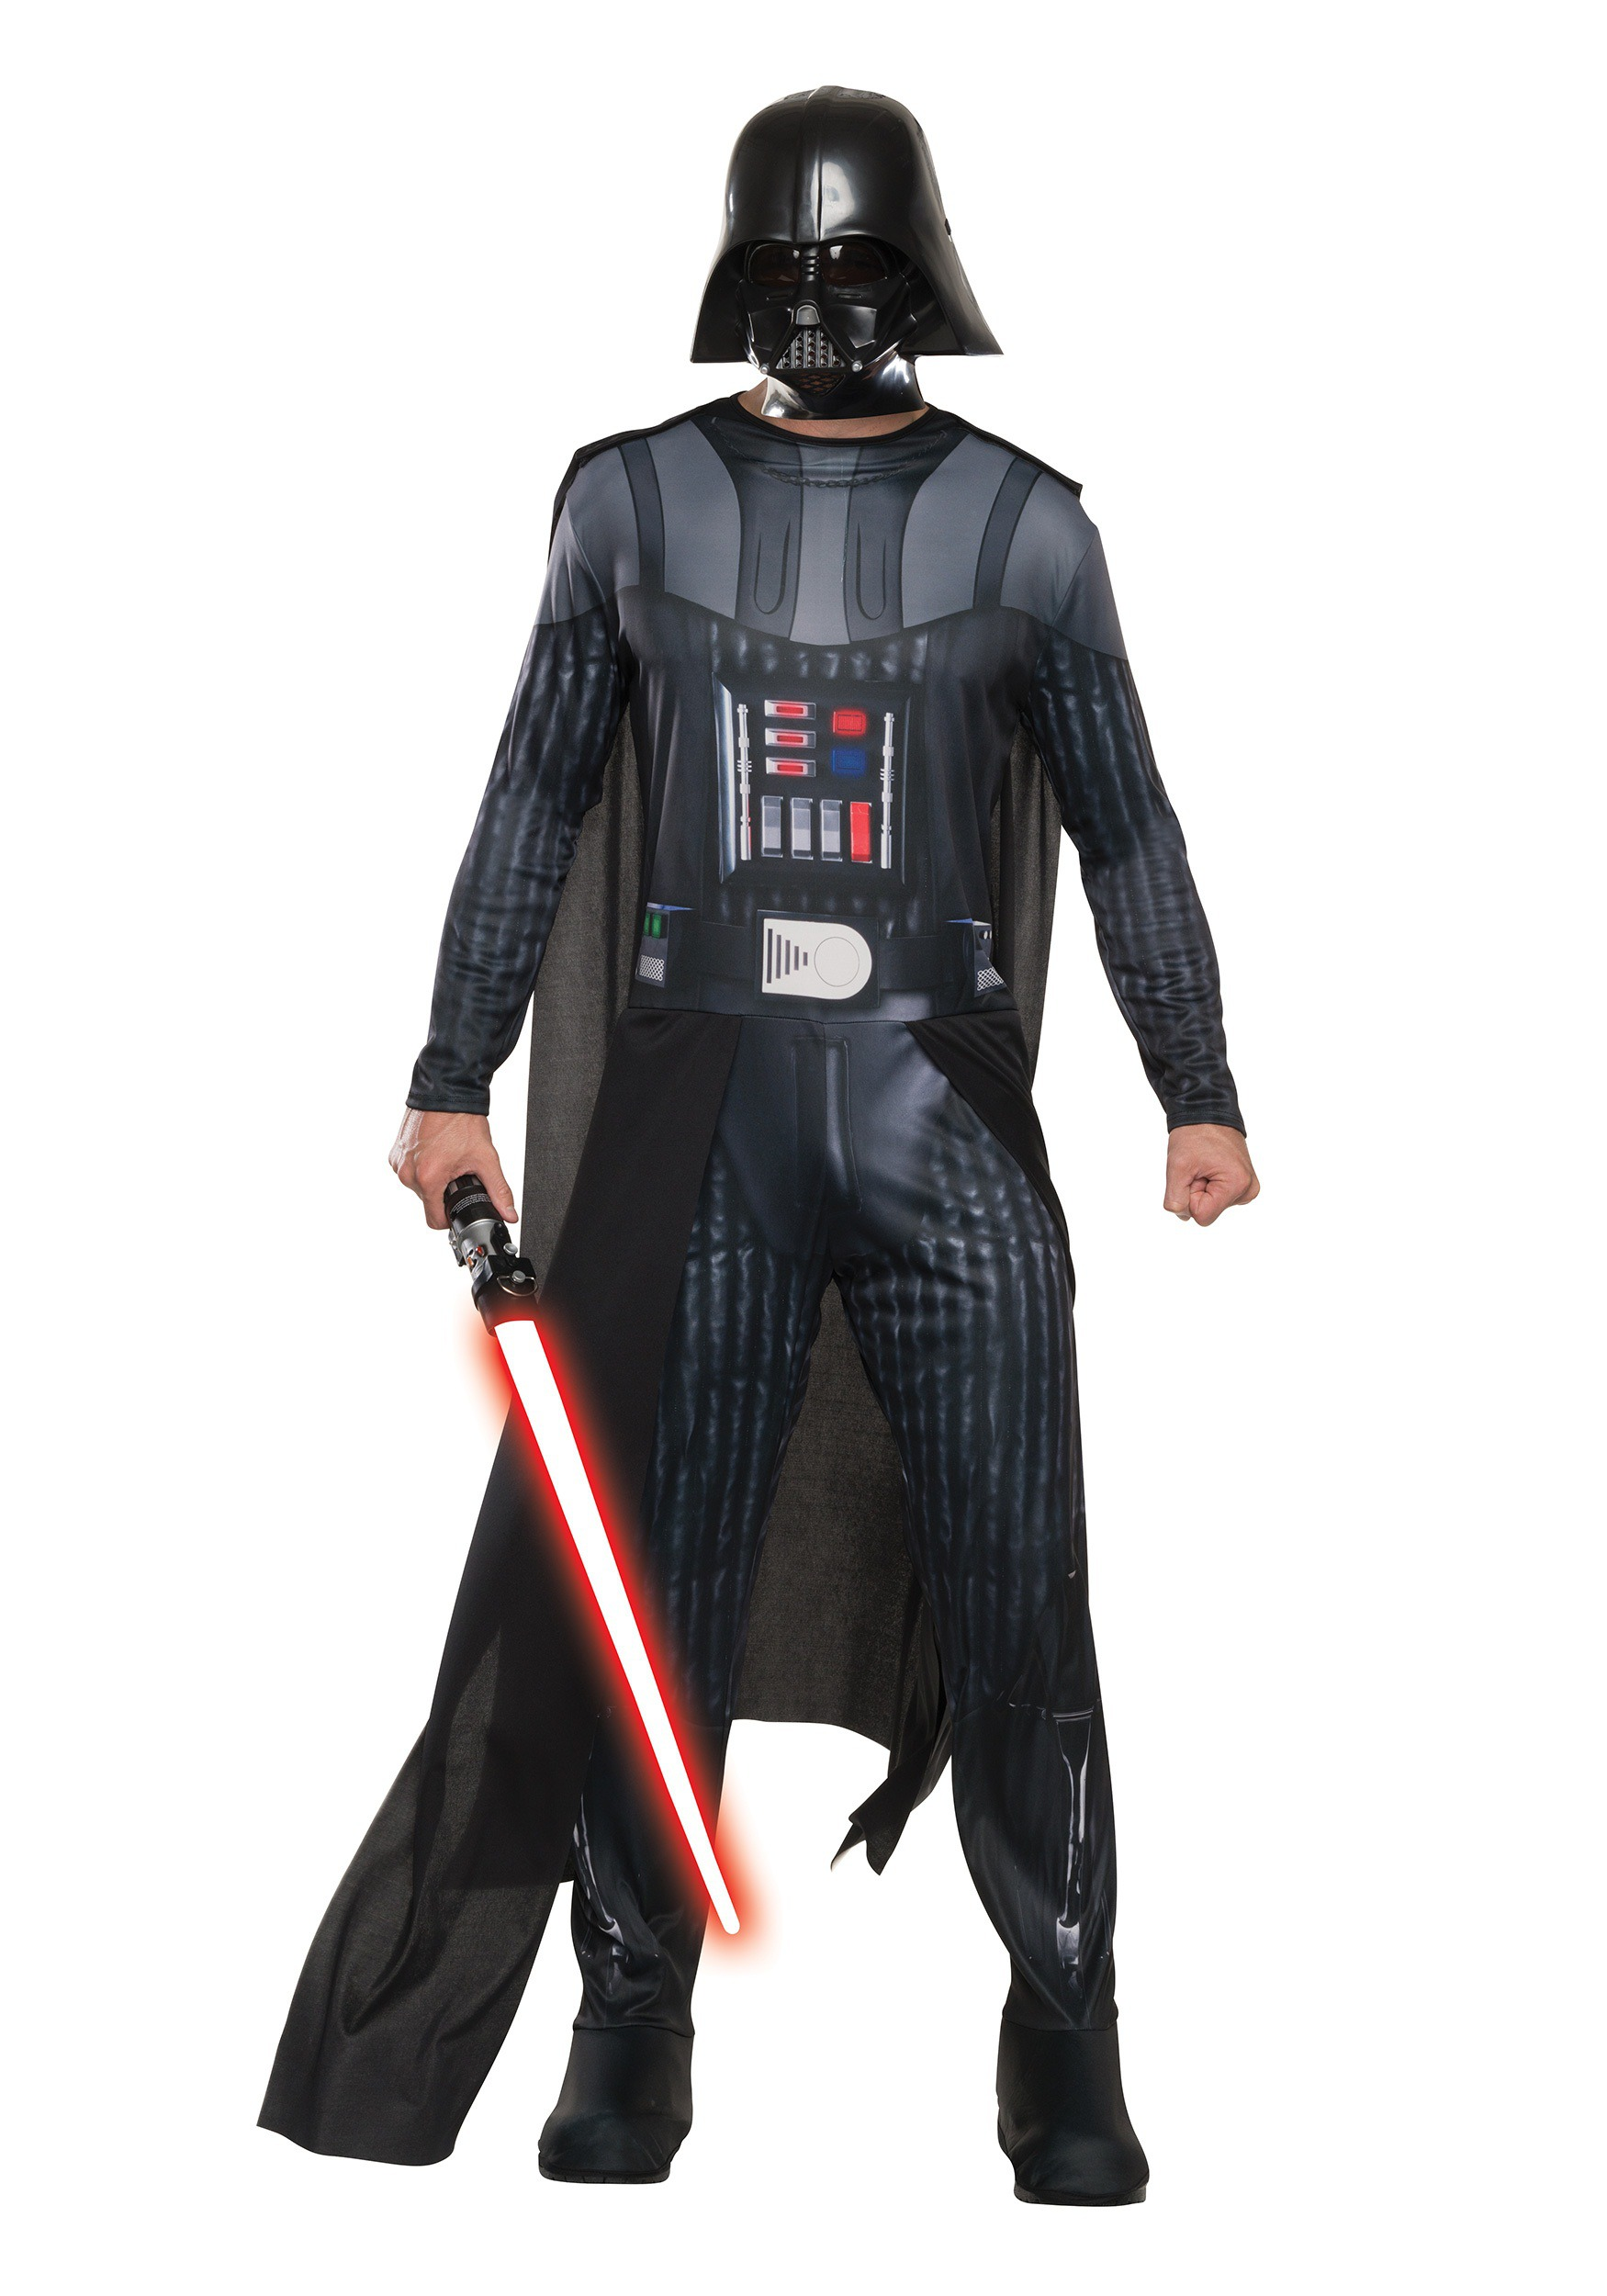 Darth Vader Costume for Adult